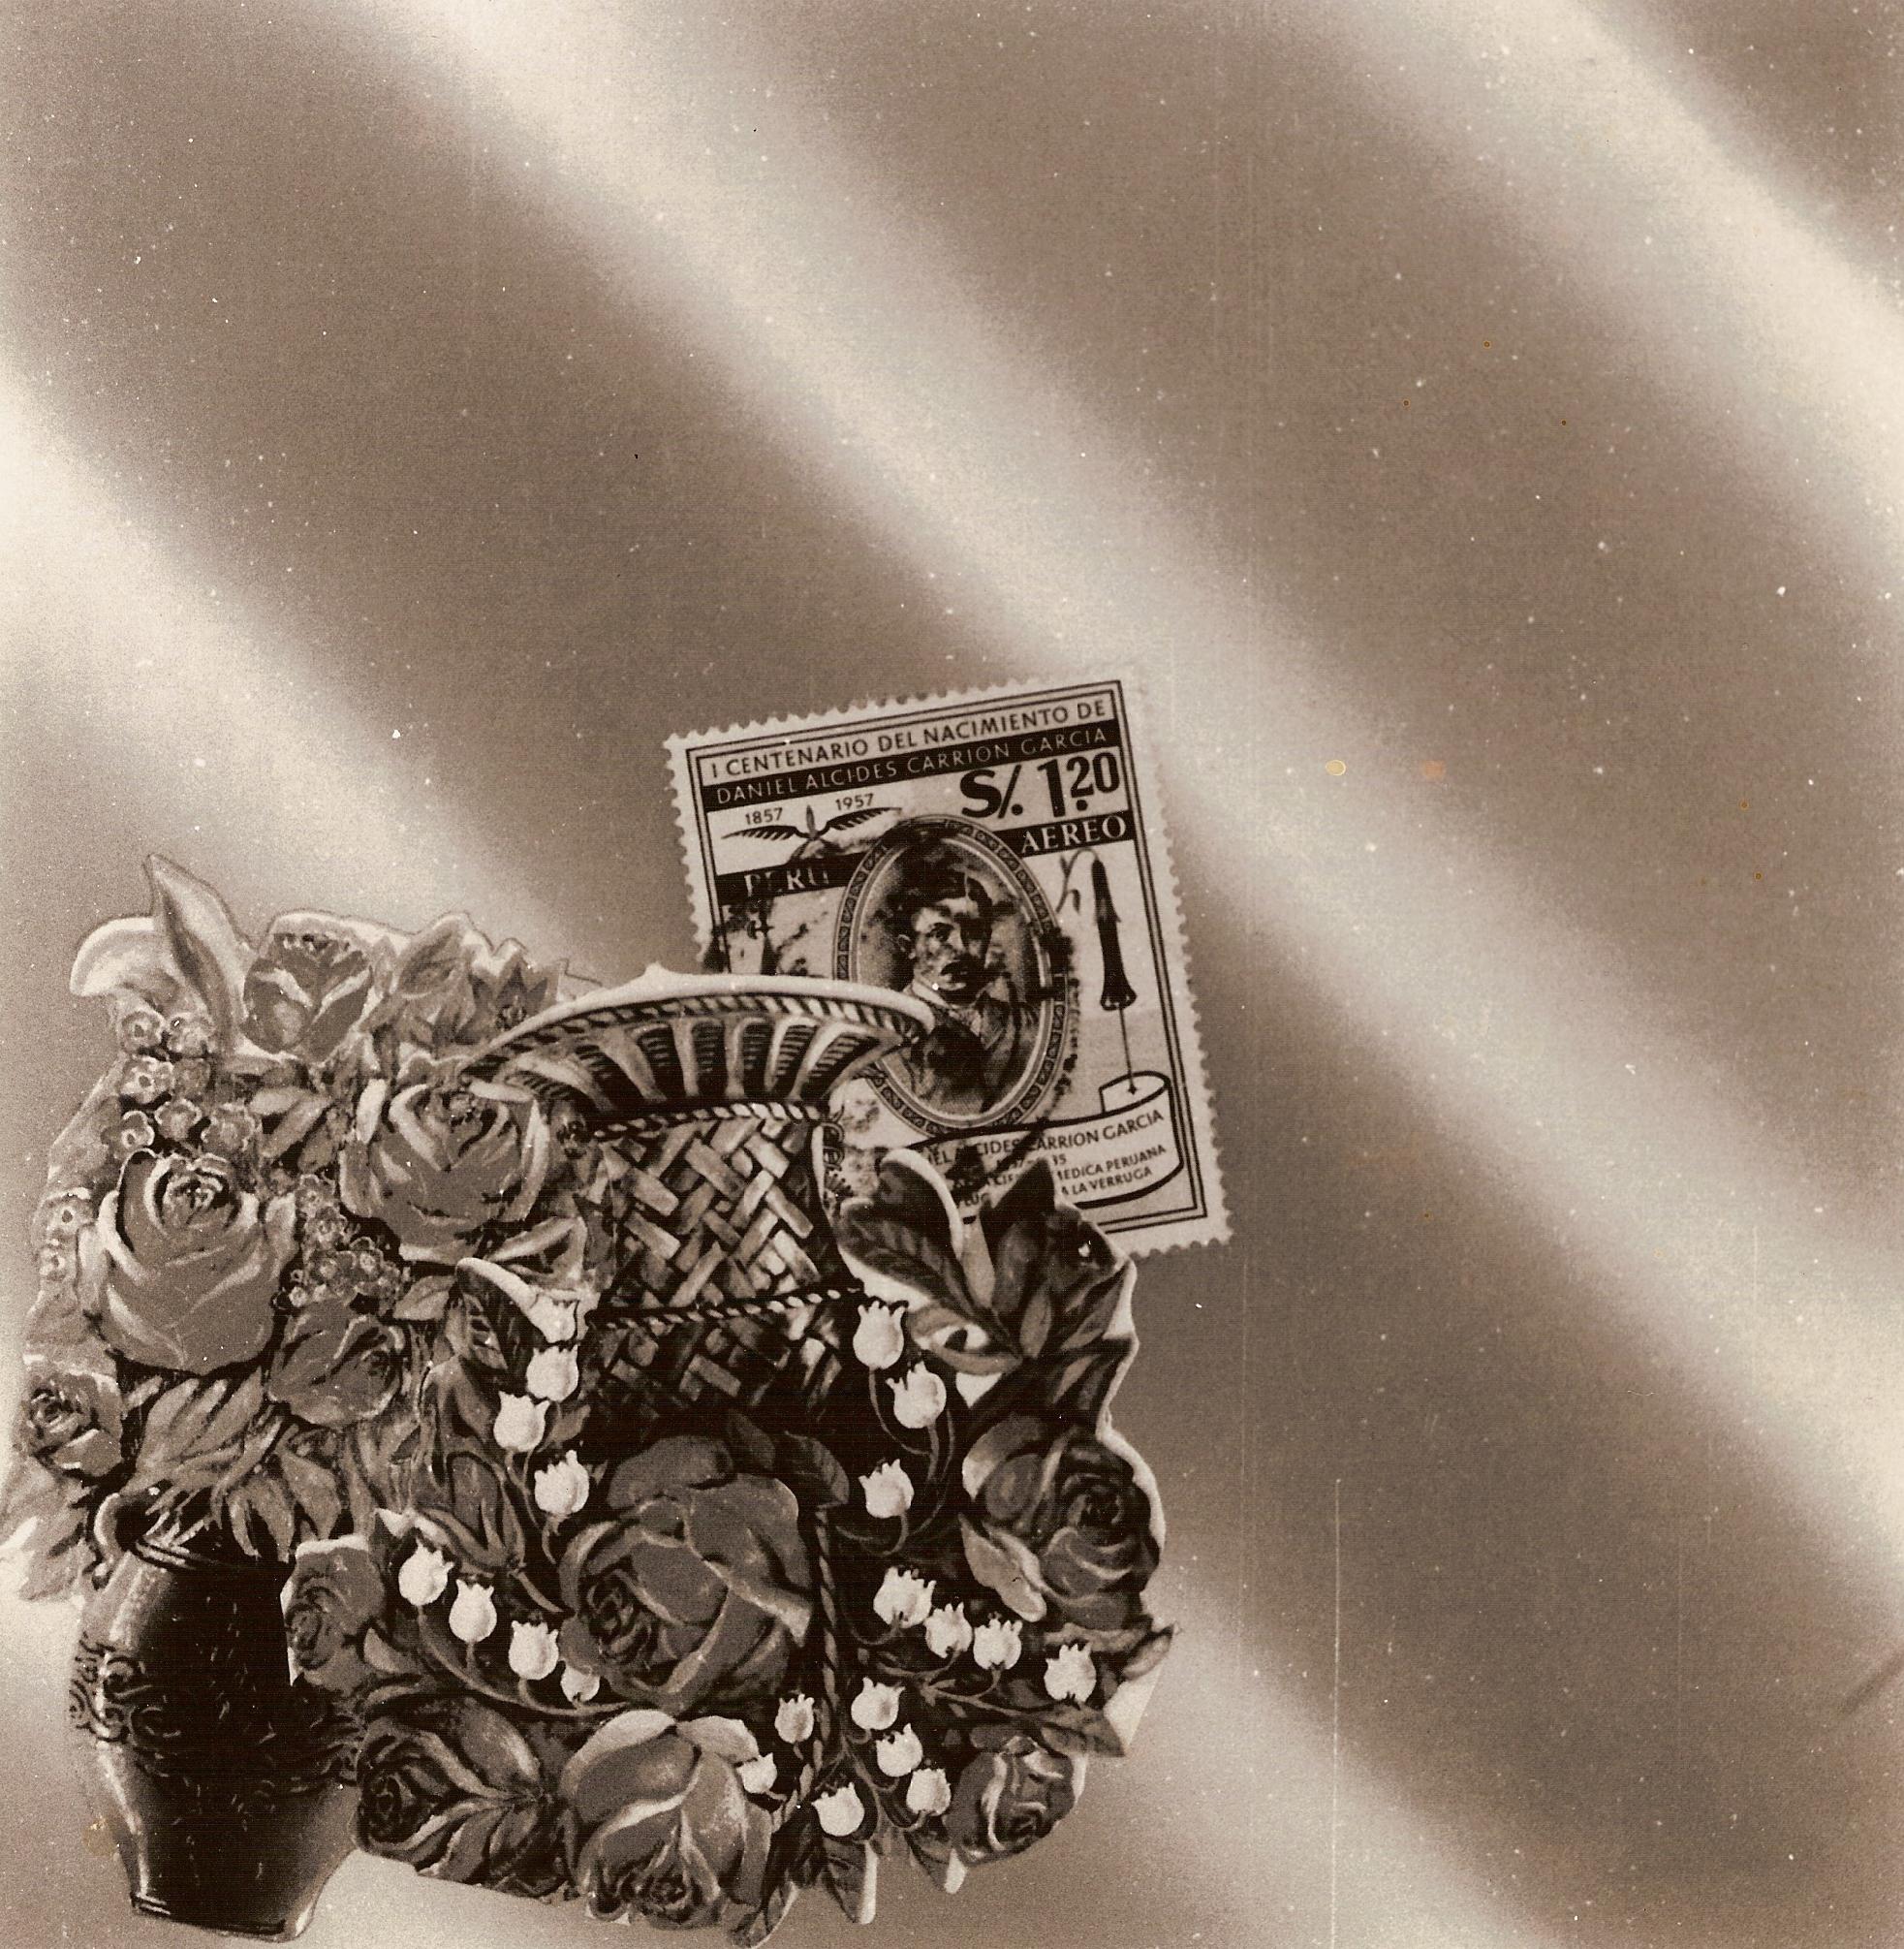 La historia,  papel collage, 15 cm x 15 cm, 1999